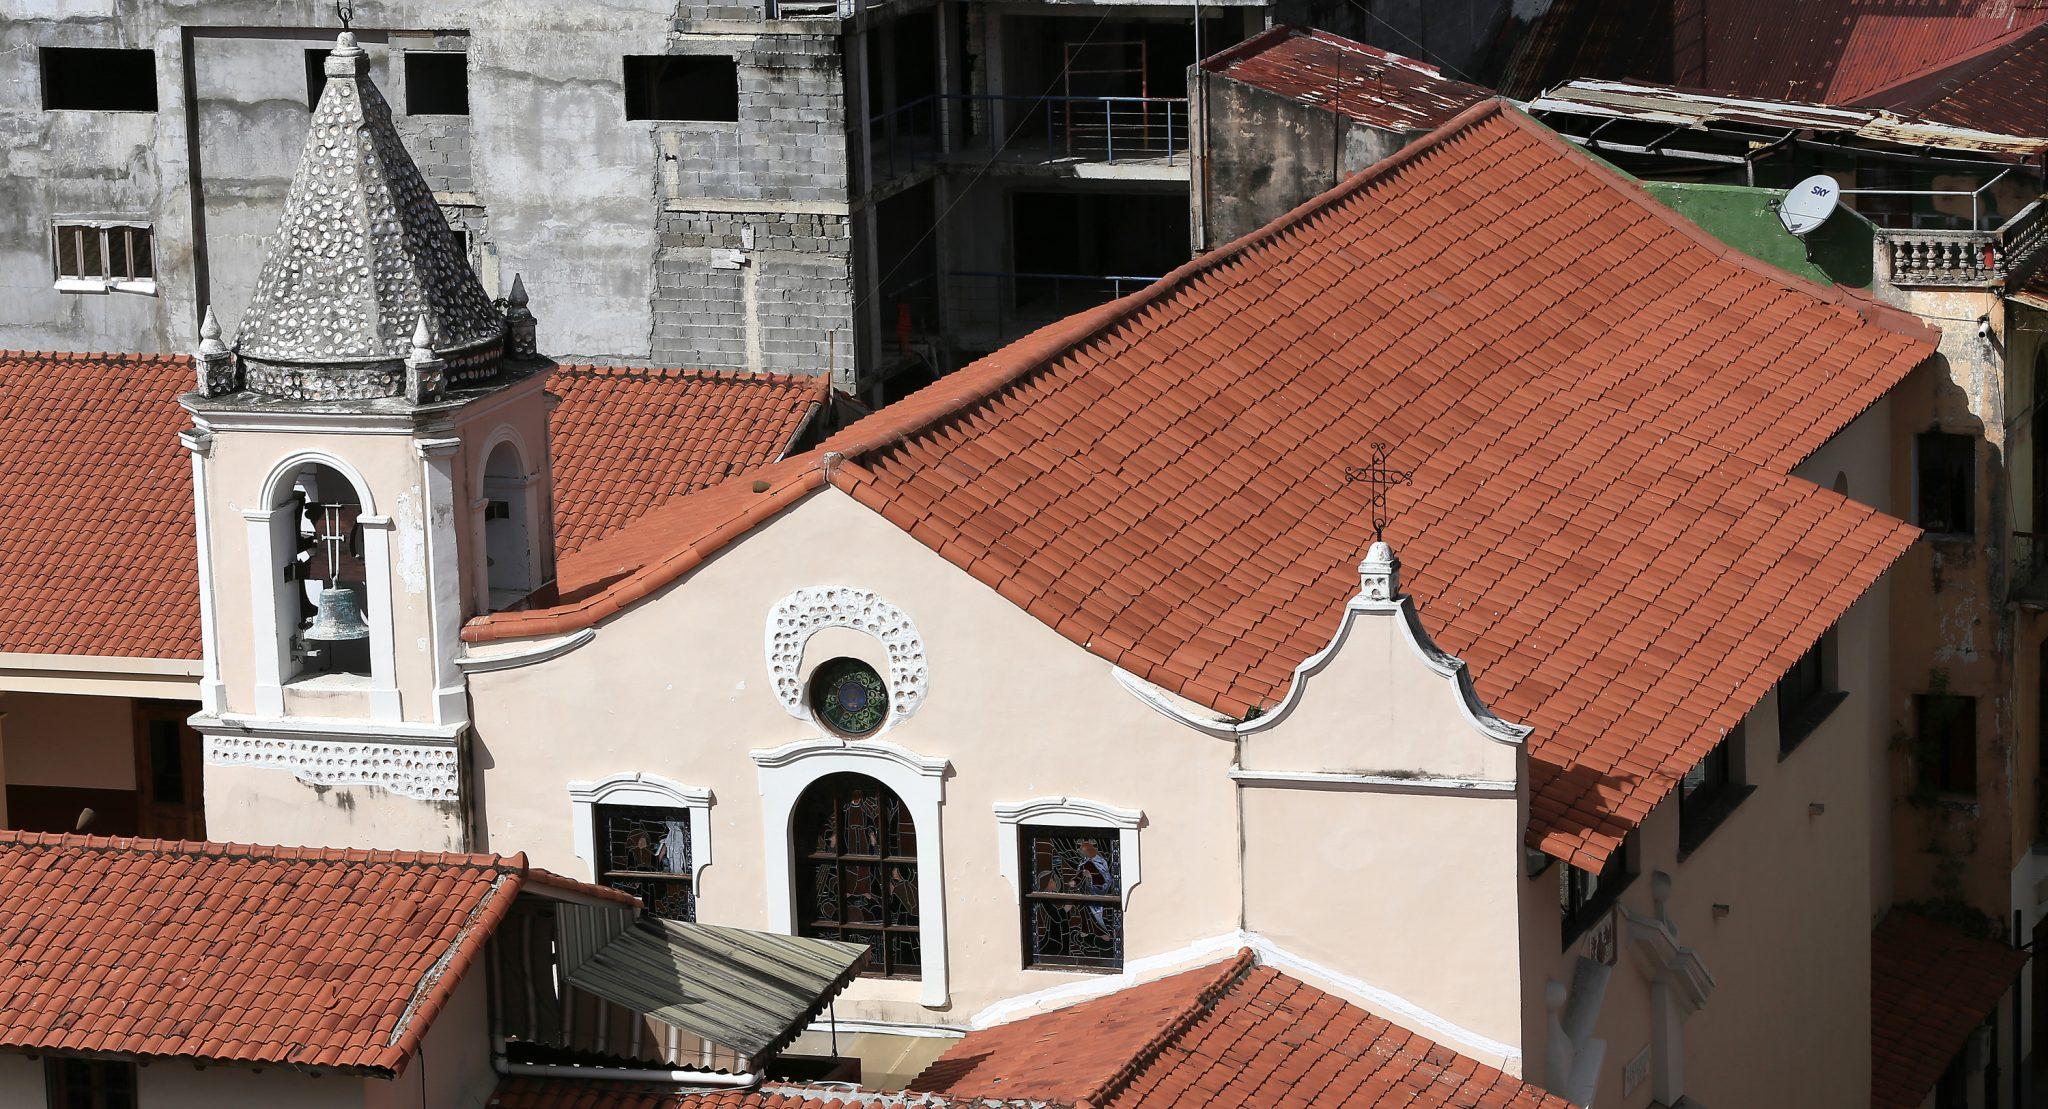 03. Oratorio San Felipe Nery